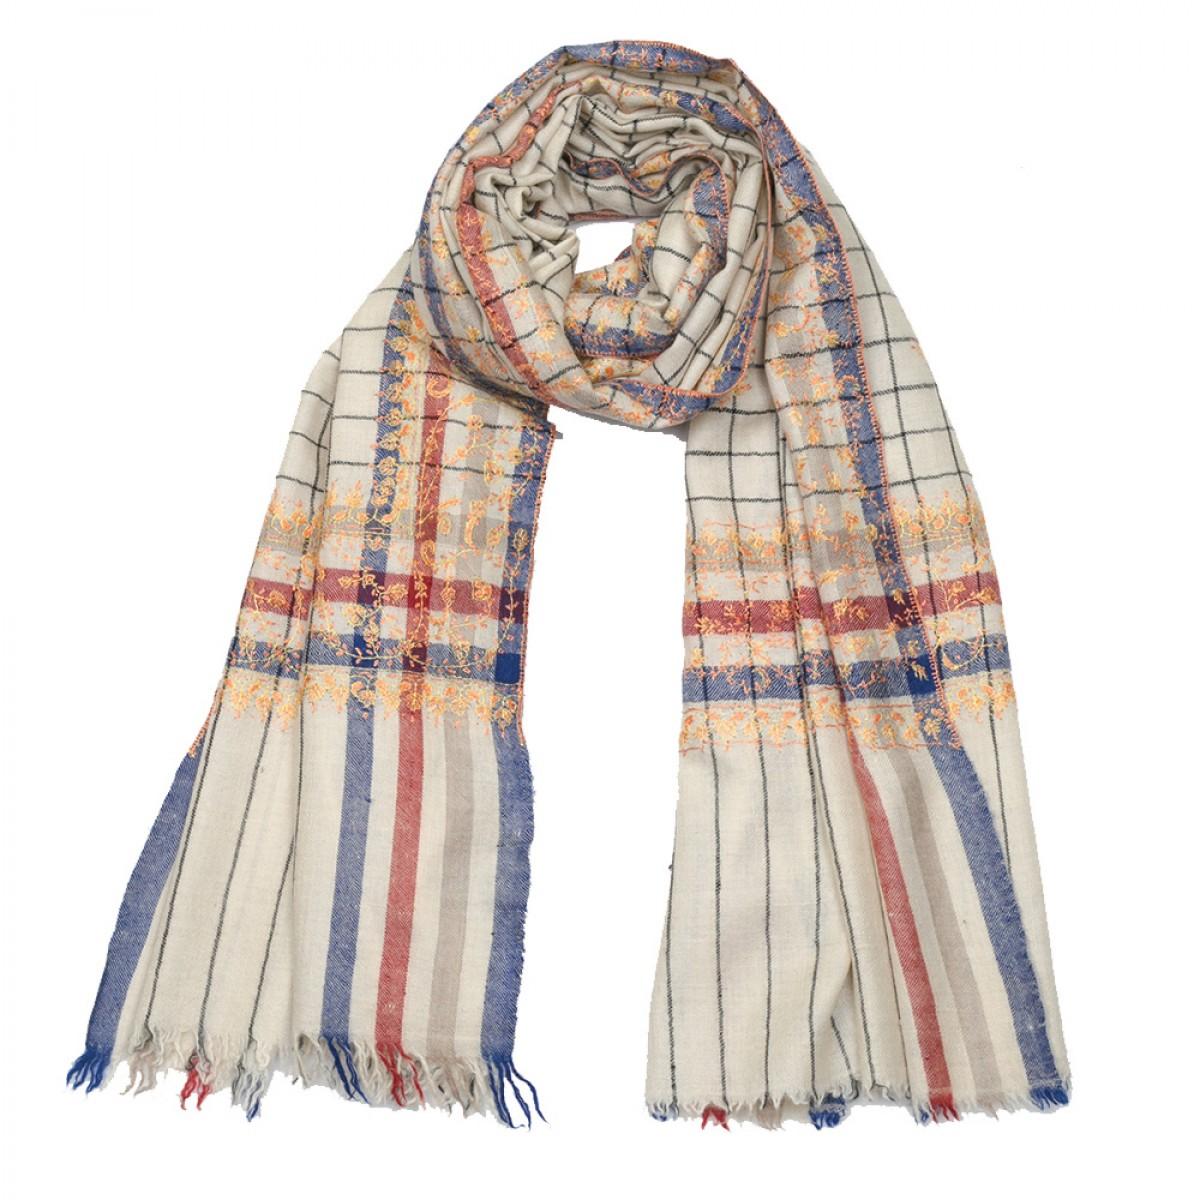 Embroidered Pashmina stole - Stripes